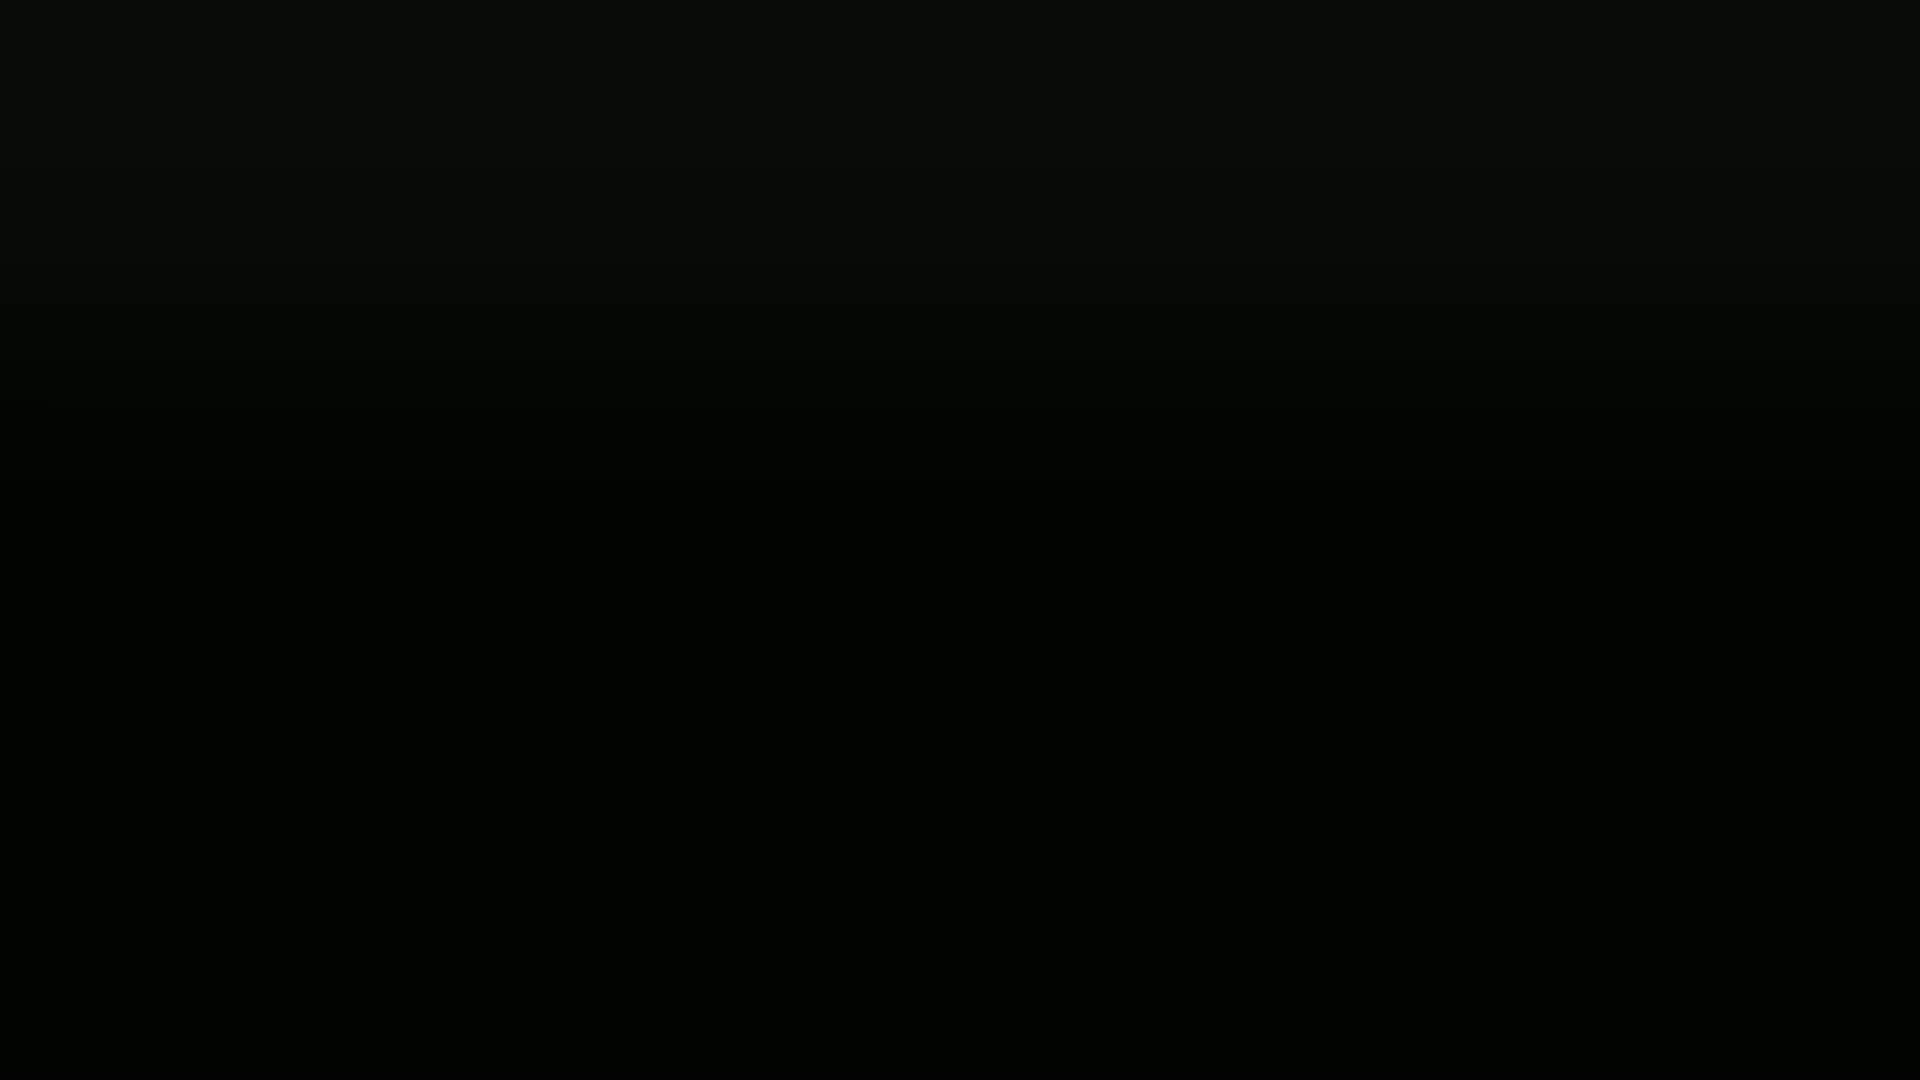 HAMEZO~ハメ撮りコレクション~vol.34 - 山口夏美【騎乗位 騎乗後背位 バック 正常位 中出し】